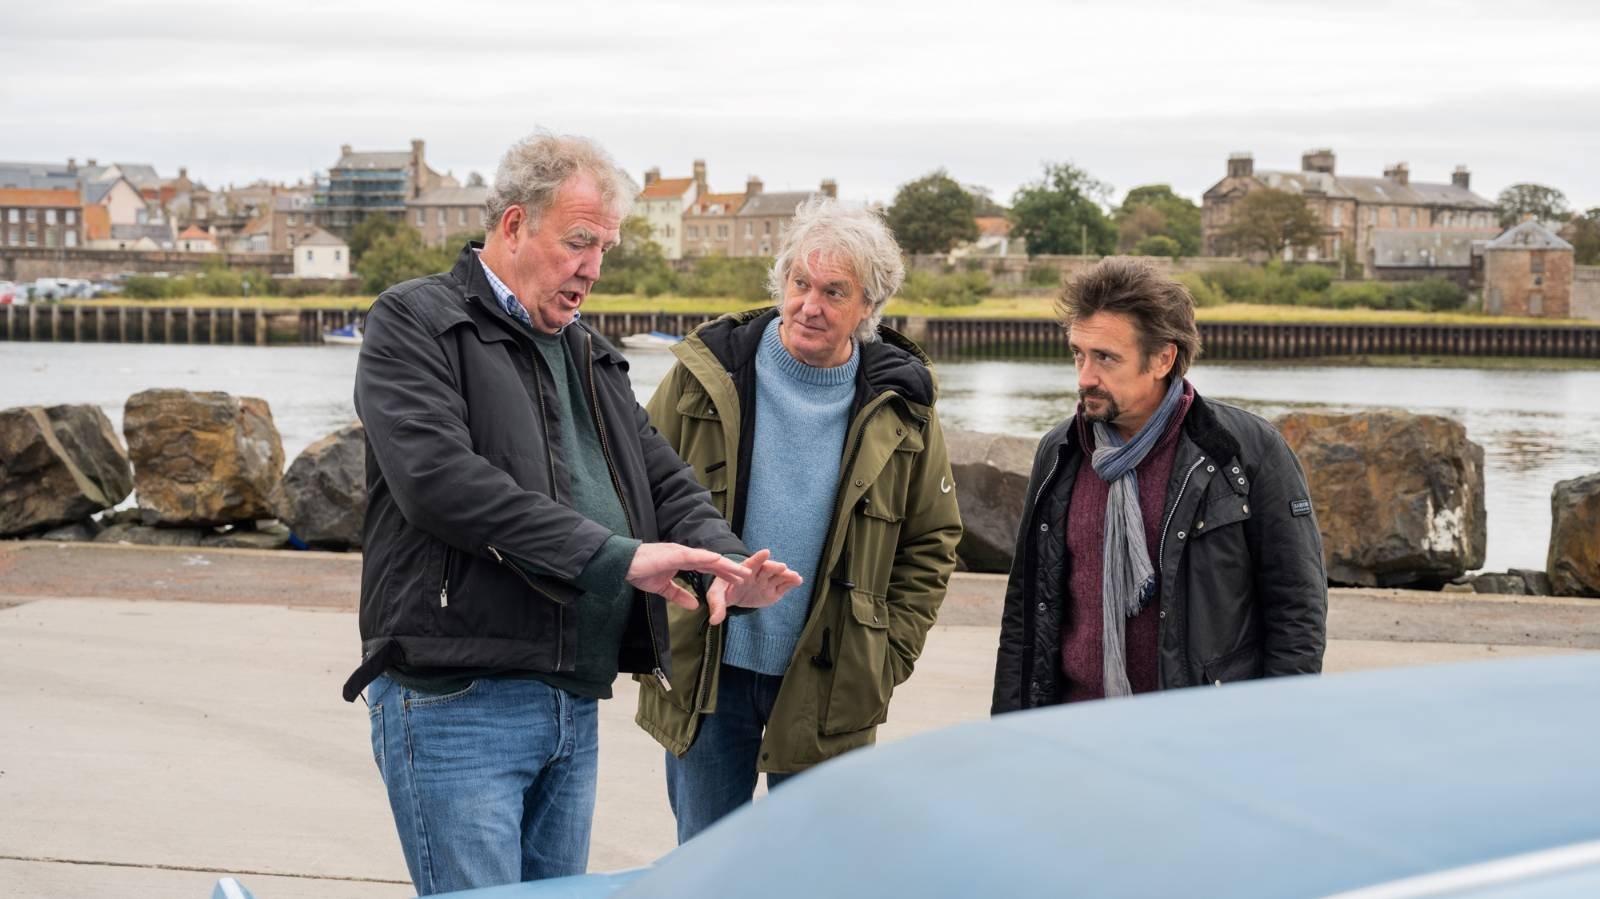 Have Amazon's Grand Tour trio finally found Top Gear again?